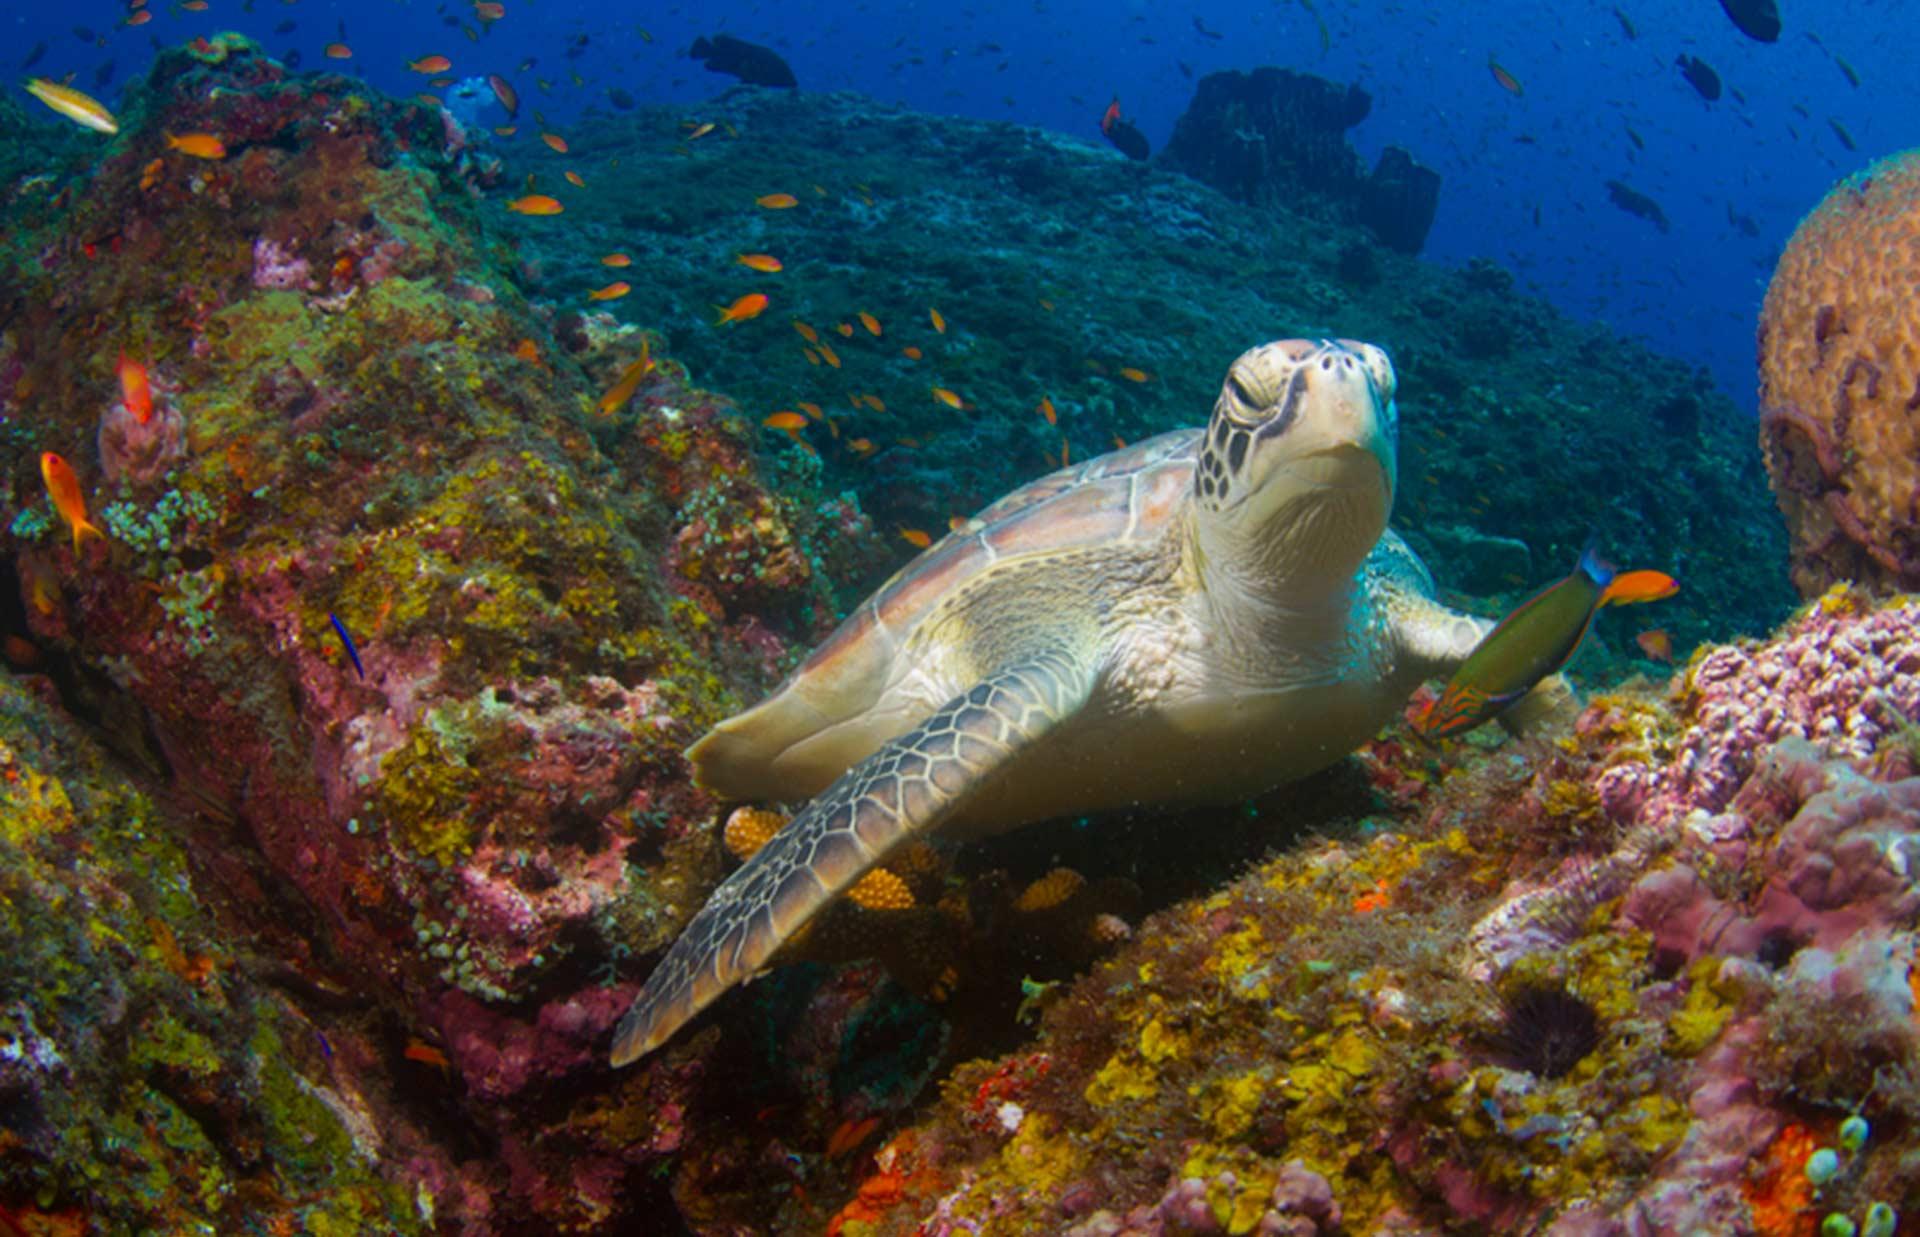 http://www.thegreatnext.com/Scuba Diving Andamans Adventure Scuba Ocean Havelock Sea Open Water PADI SSI Course